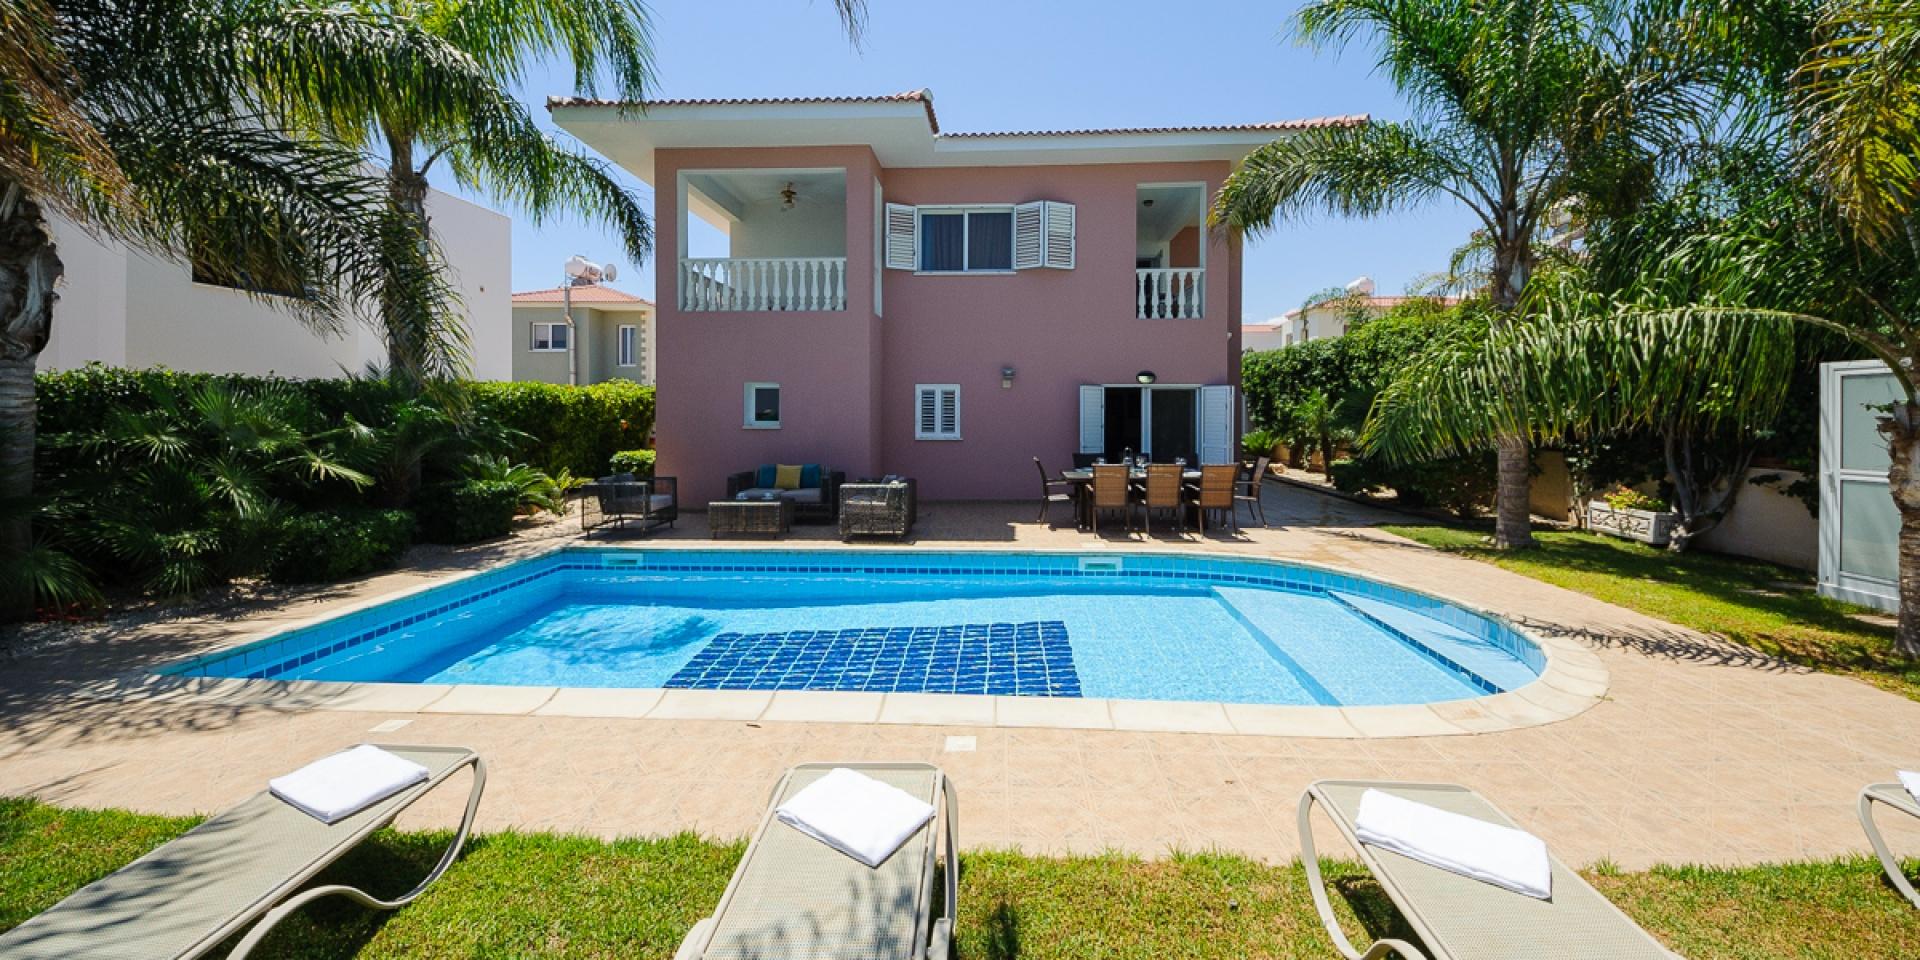 Oceanview Villa 016 - Ayia Triada, Protaras in Cyprus